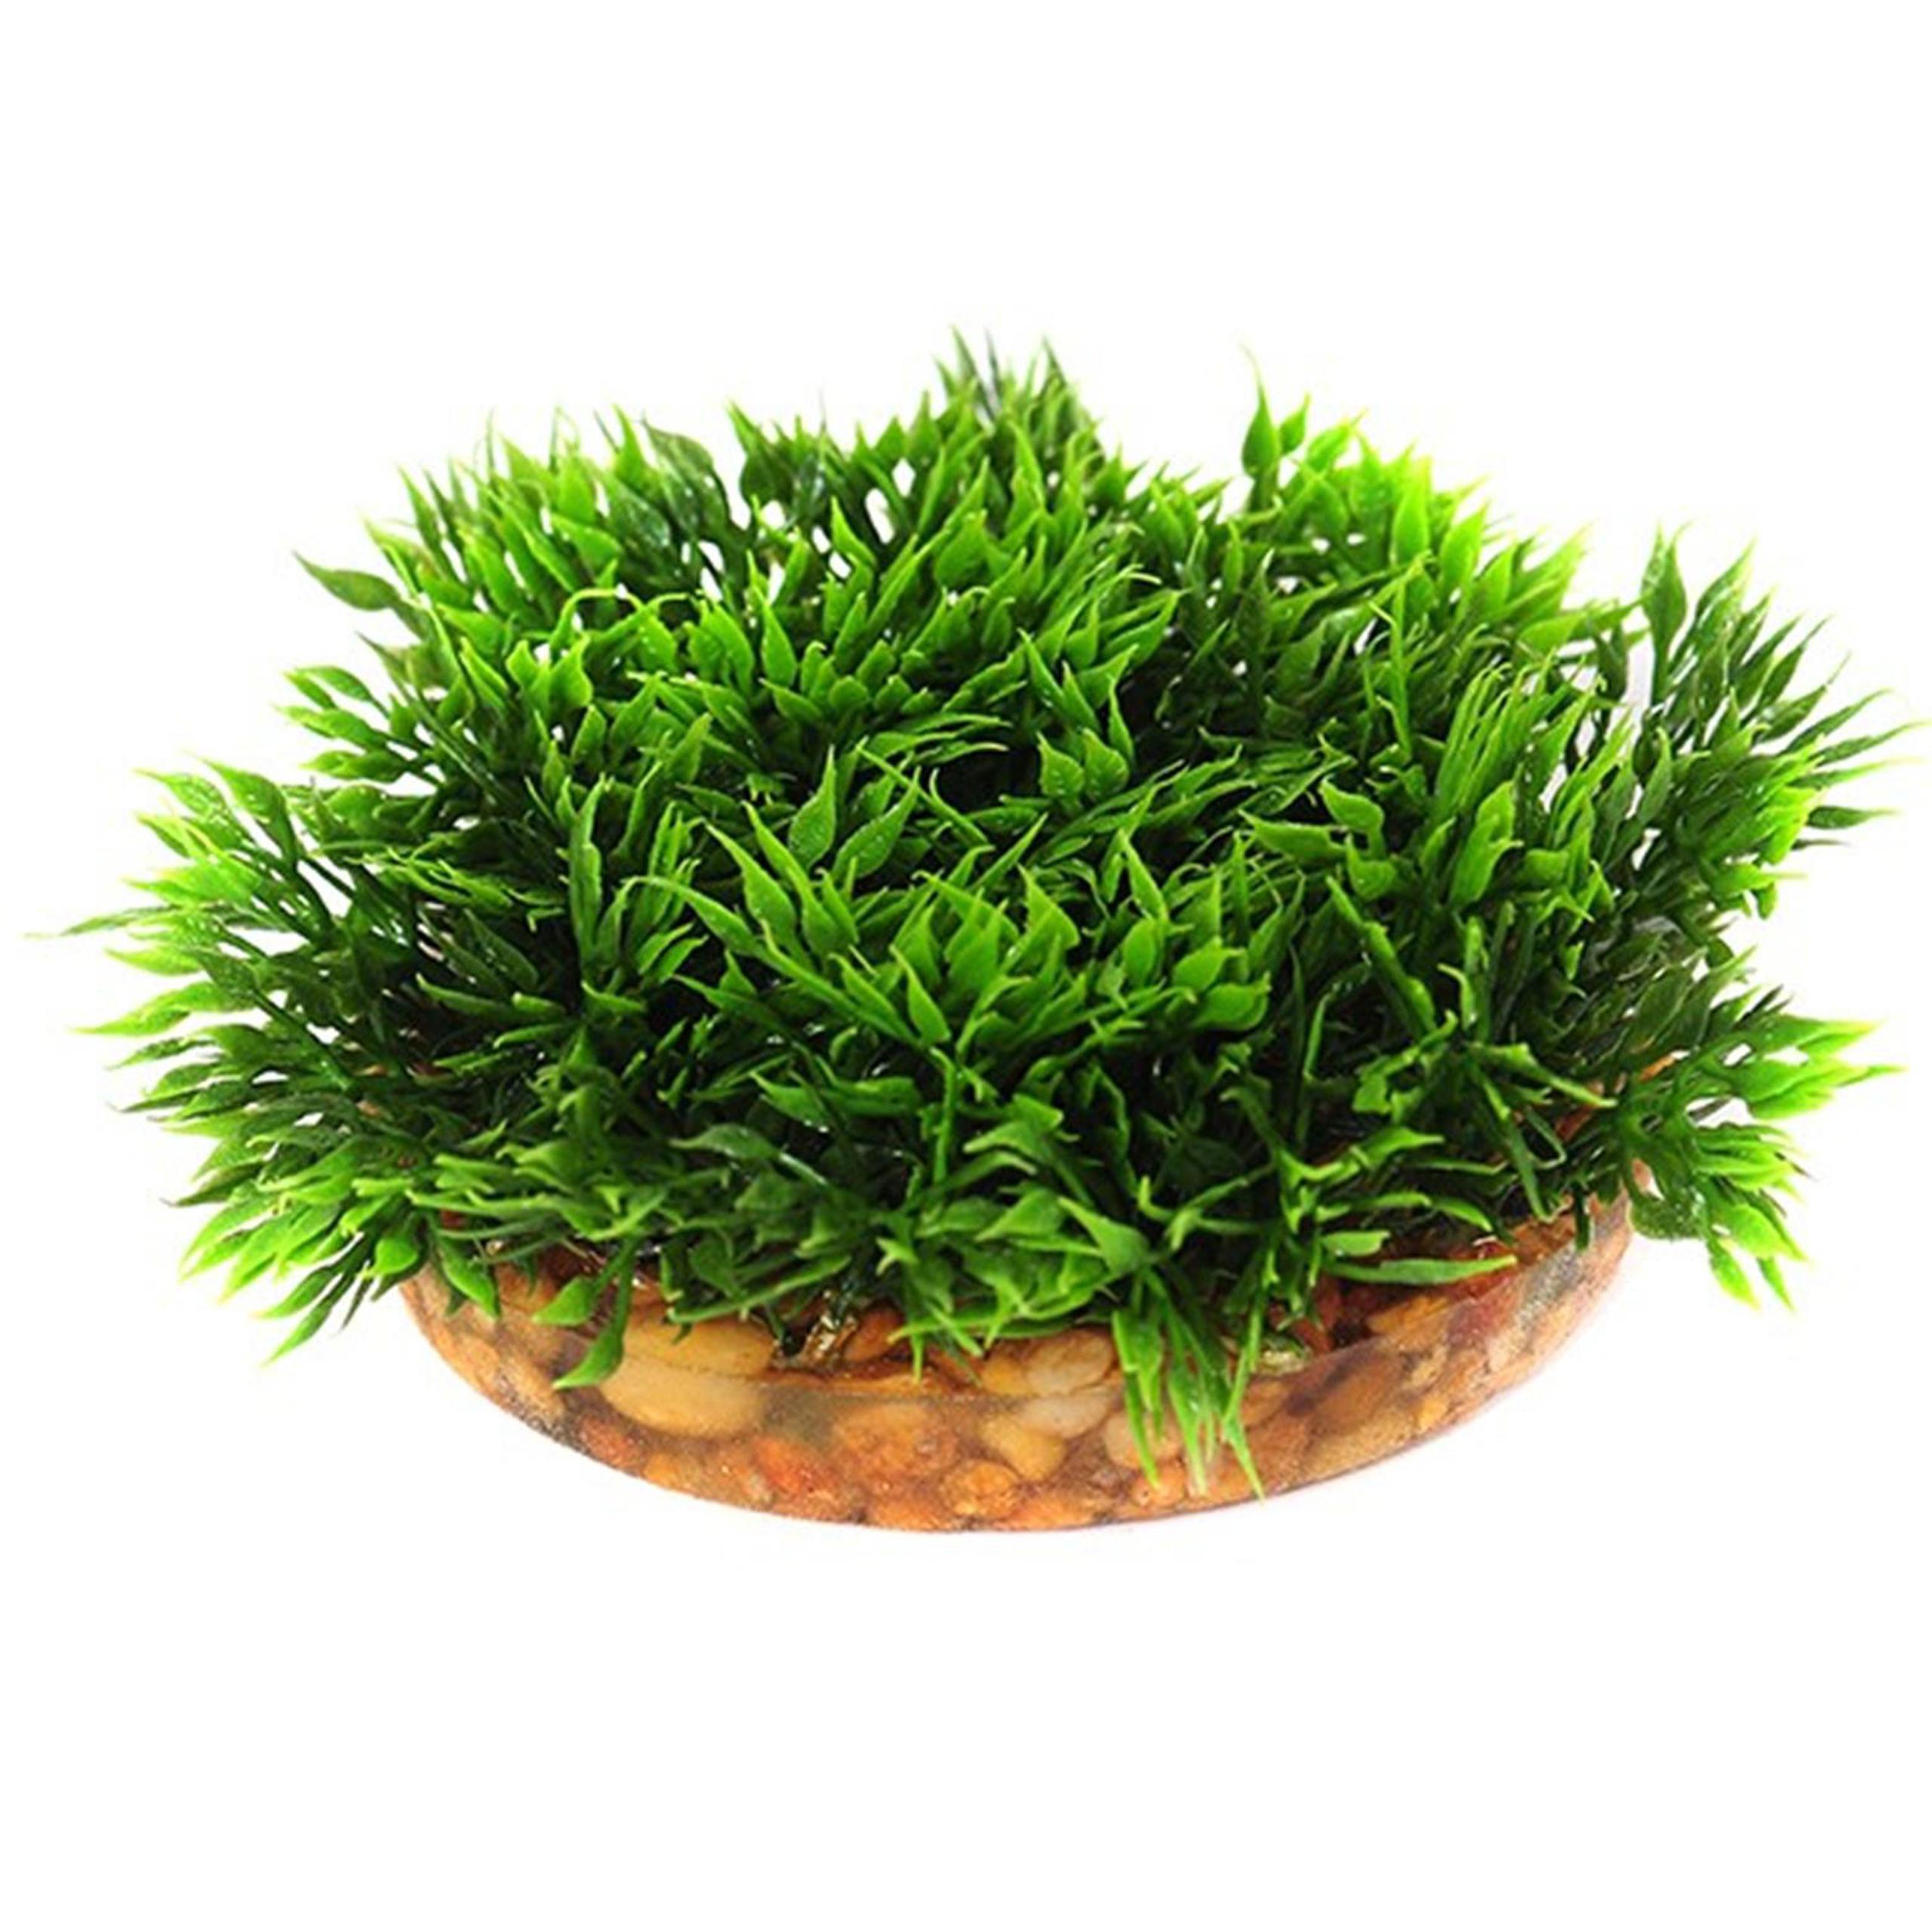 Umelé rastliny v Aqua rime AKVÁRIU dekorácie KOBR